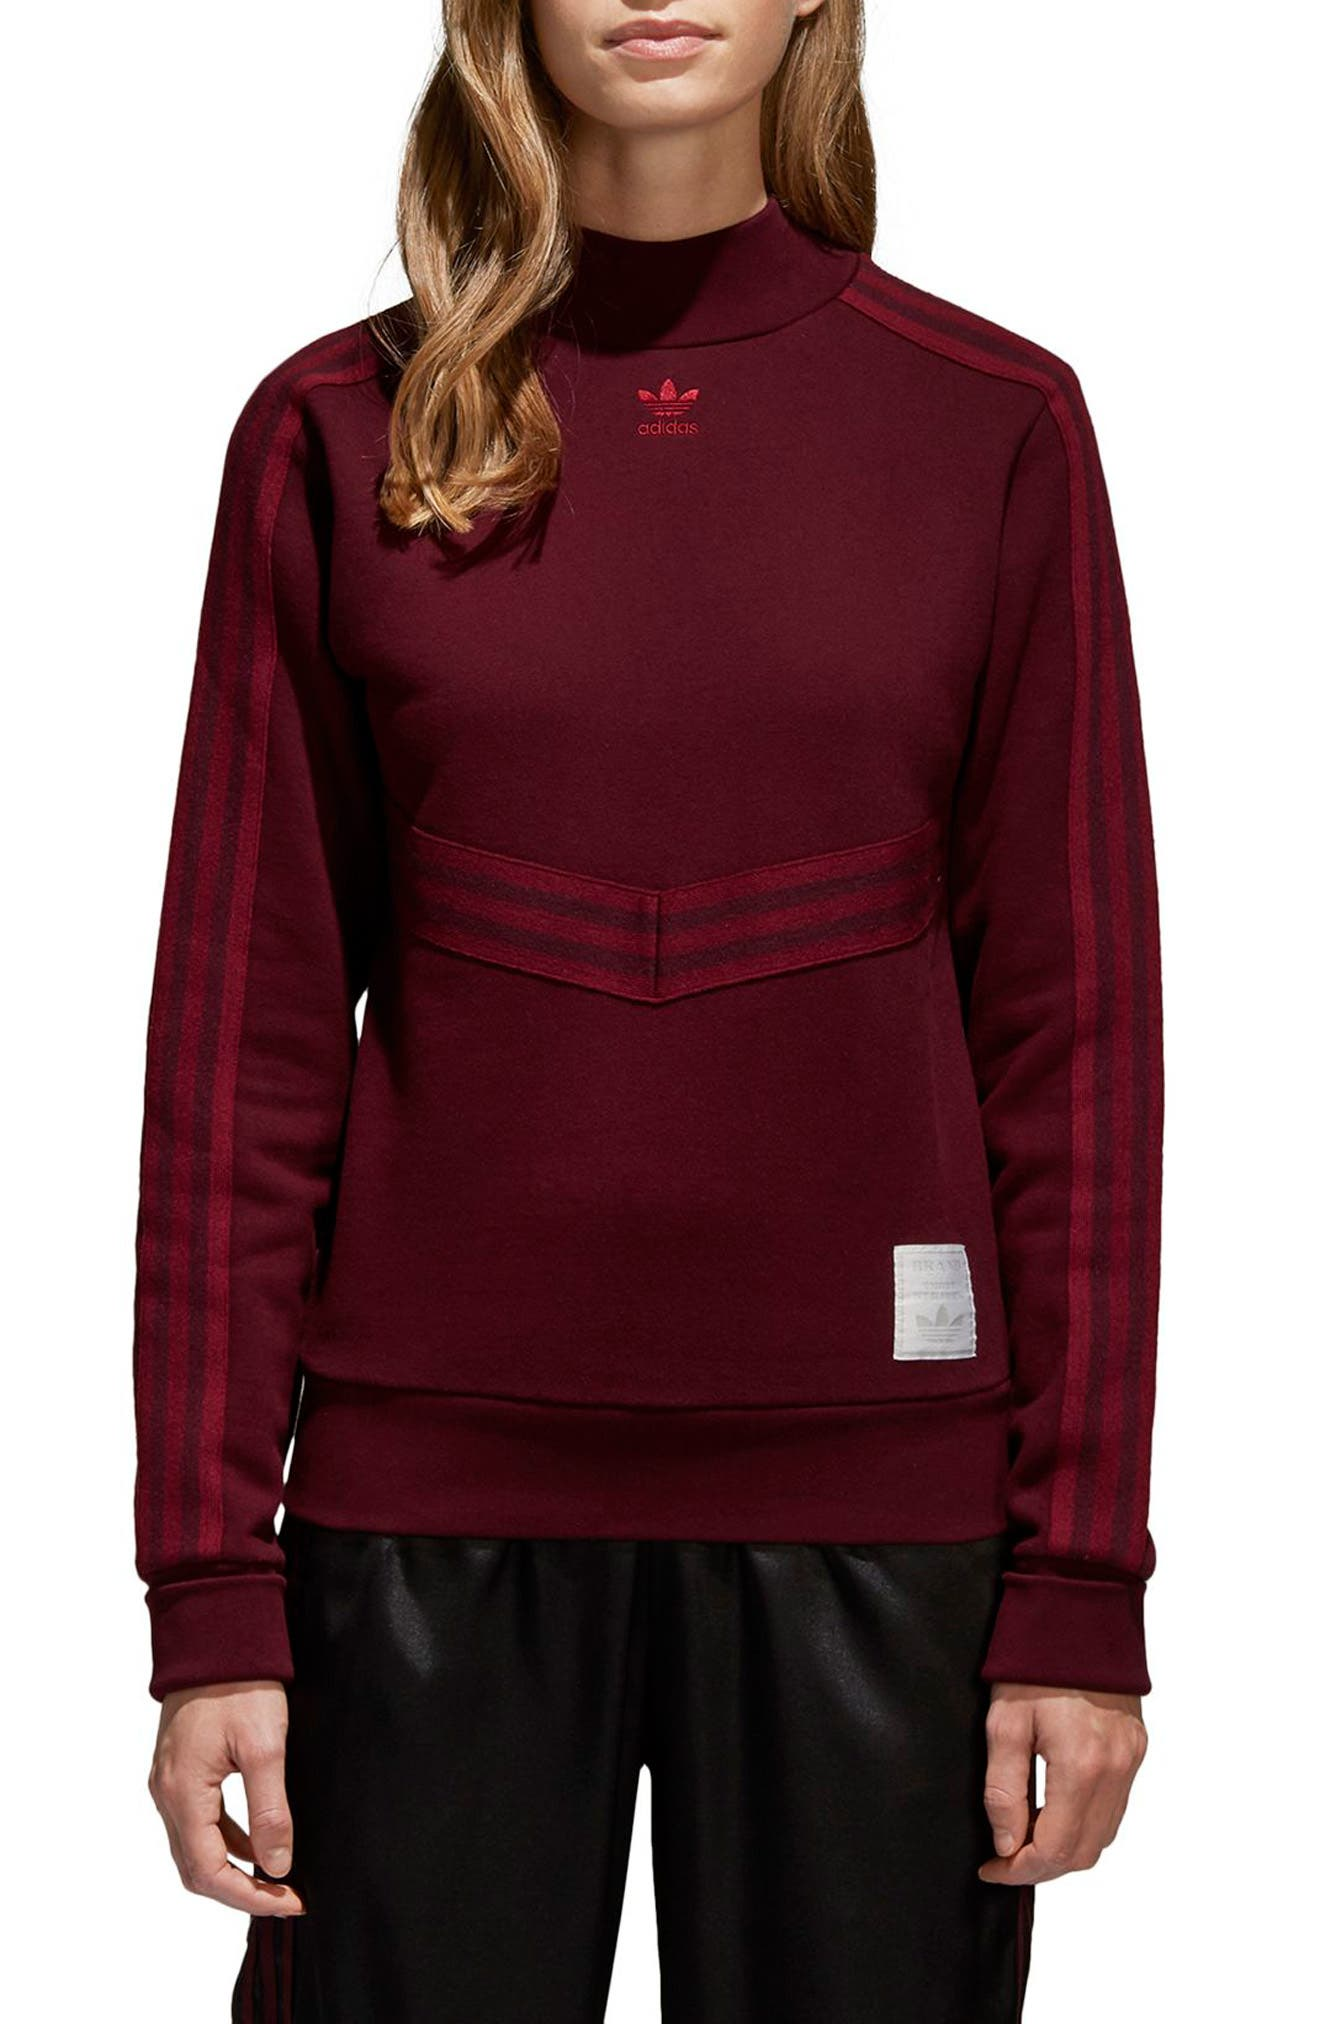 Originals Adibreak Sweatshirt,                         Main,                         color, Maroon